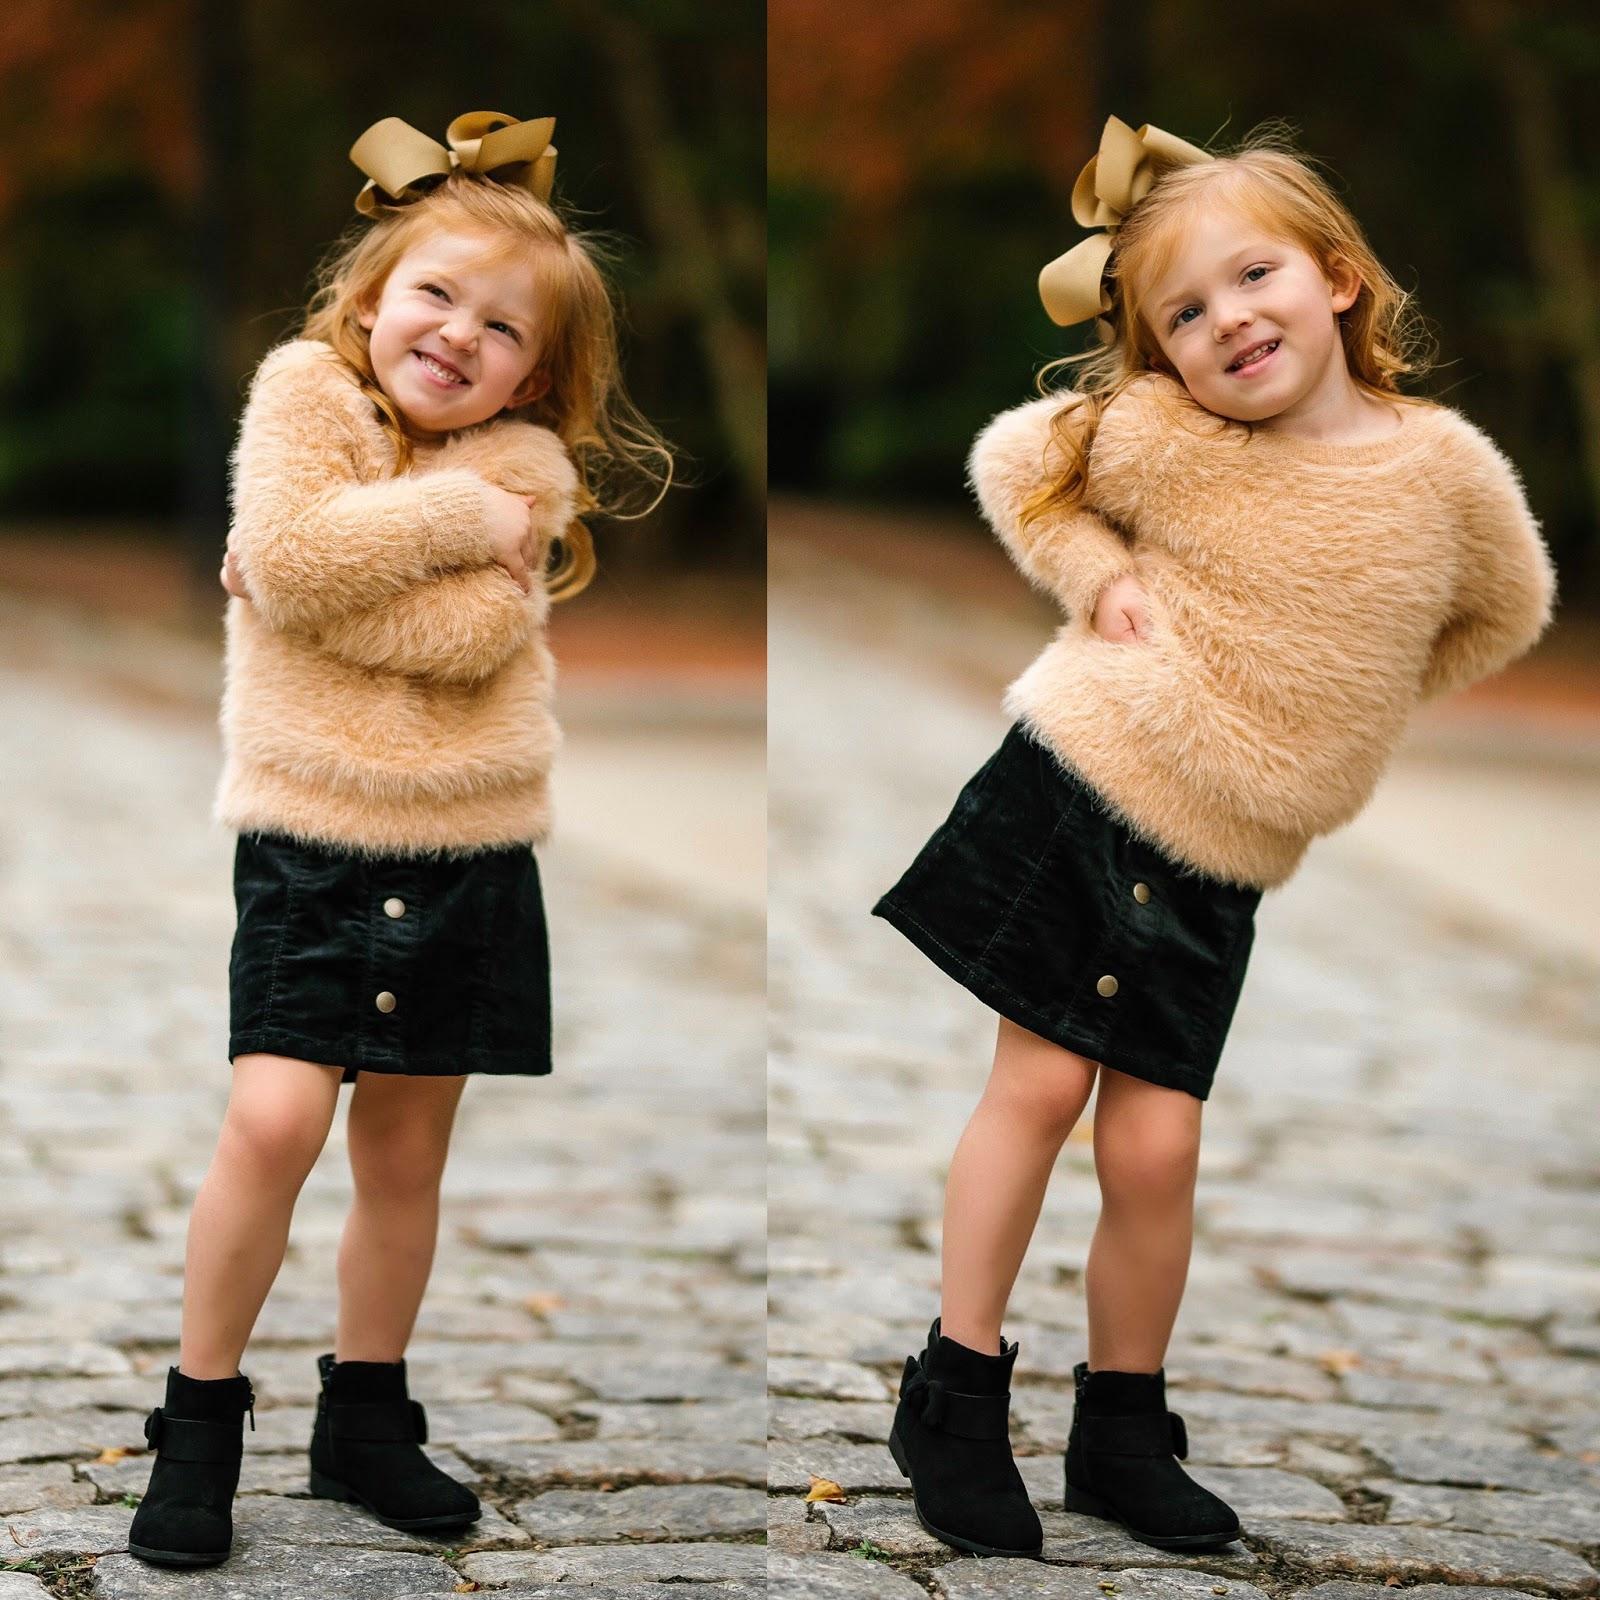 Mommy & Me Look: Twinning in Black Corduroy Skirts - Something Delightful Blog